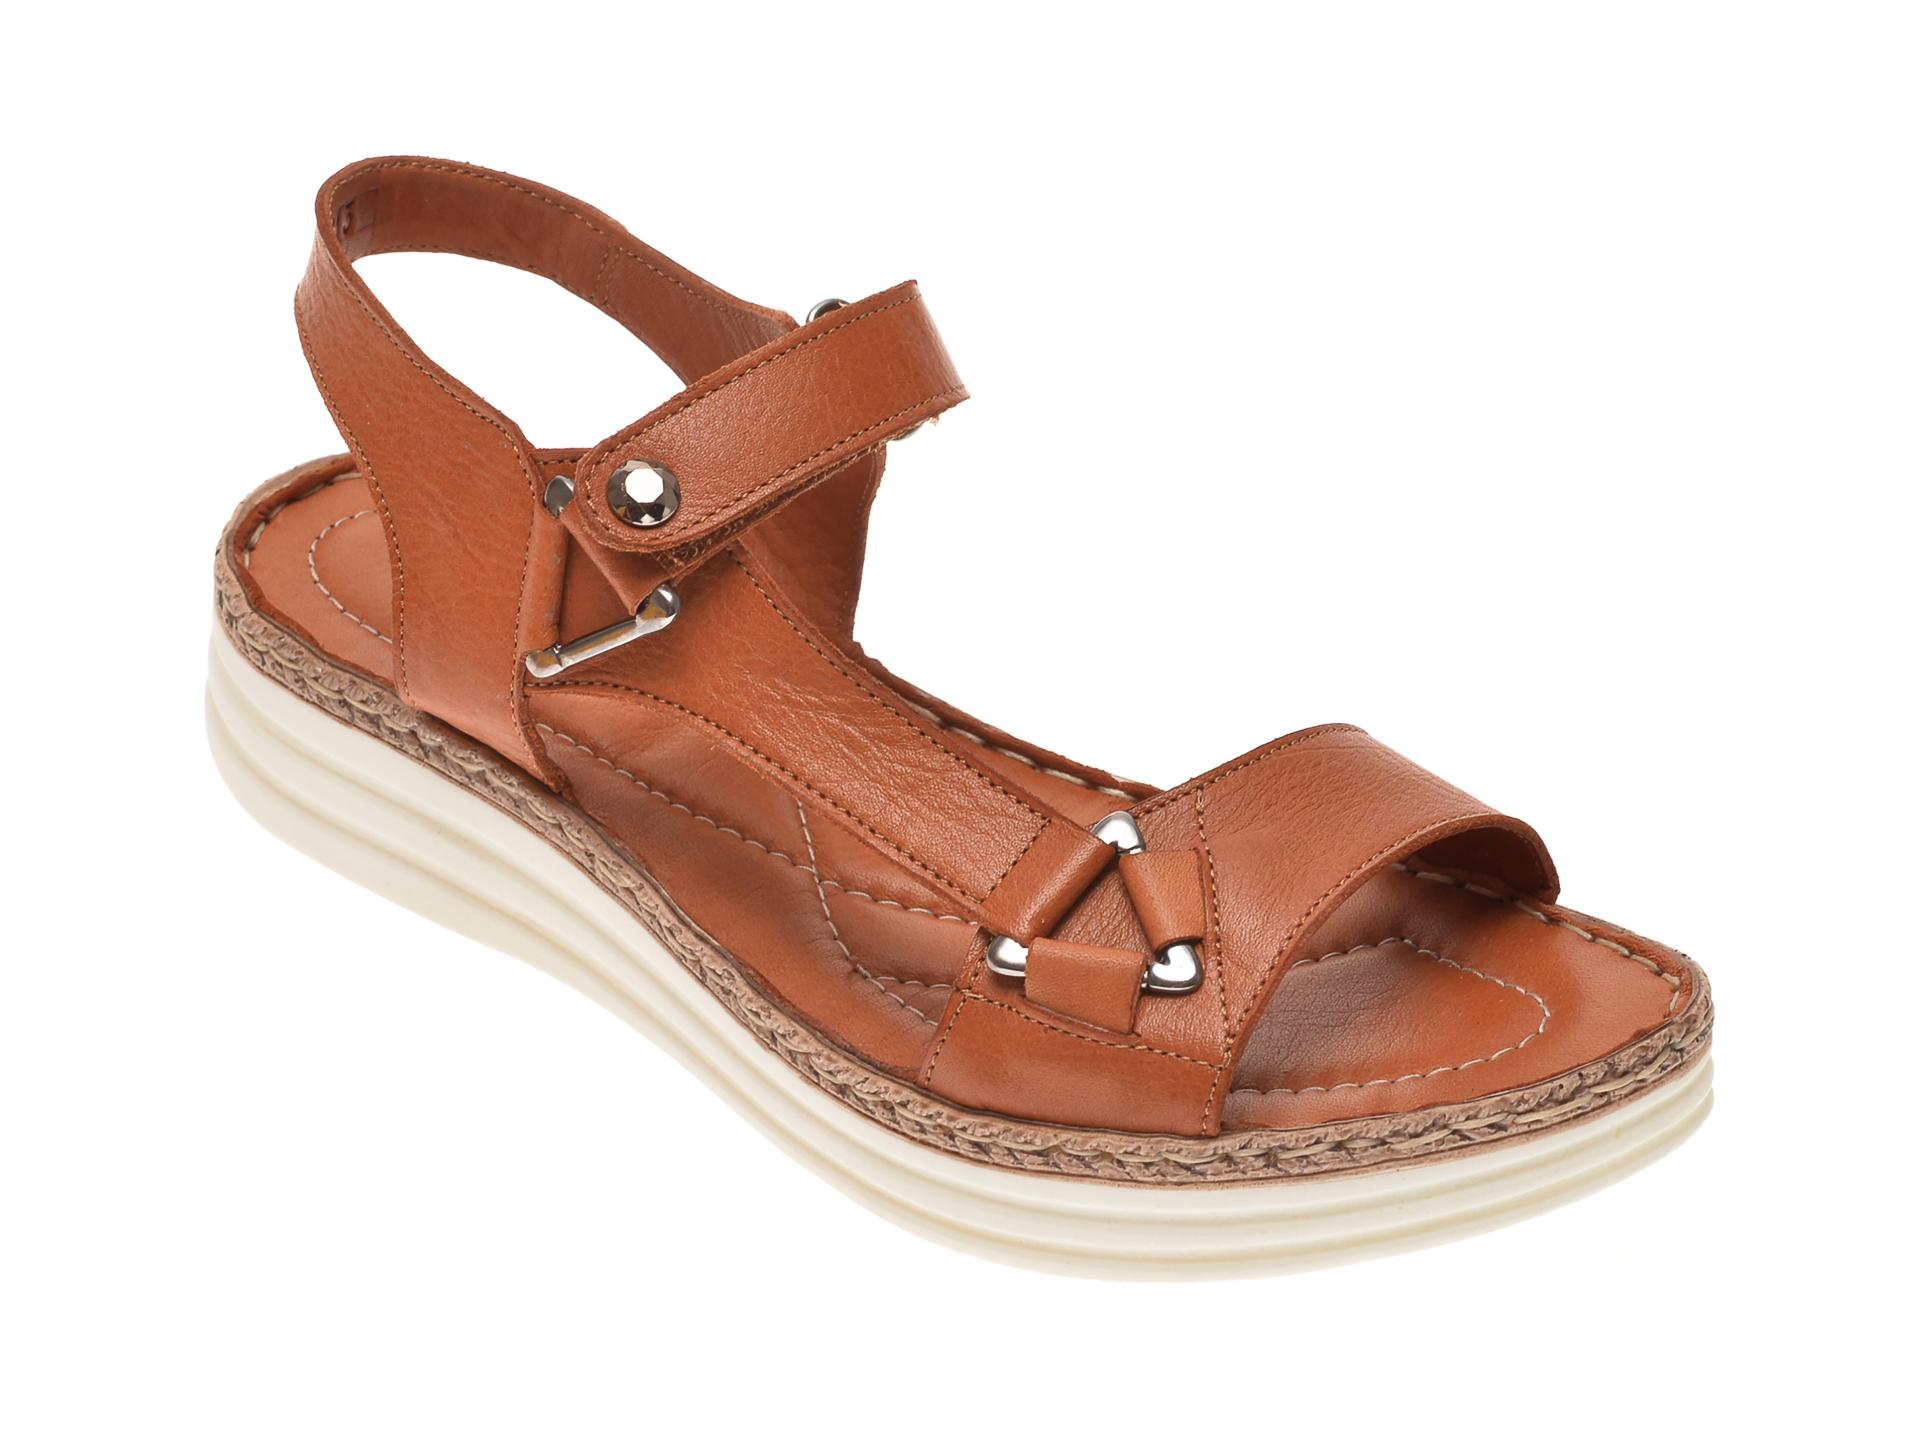 Sandale X TREND maro, 513, din piele naturala New